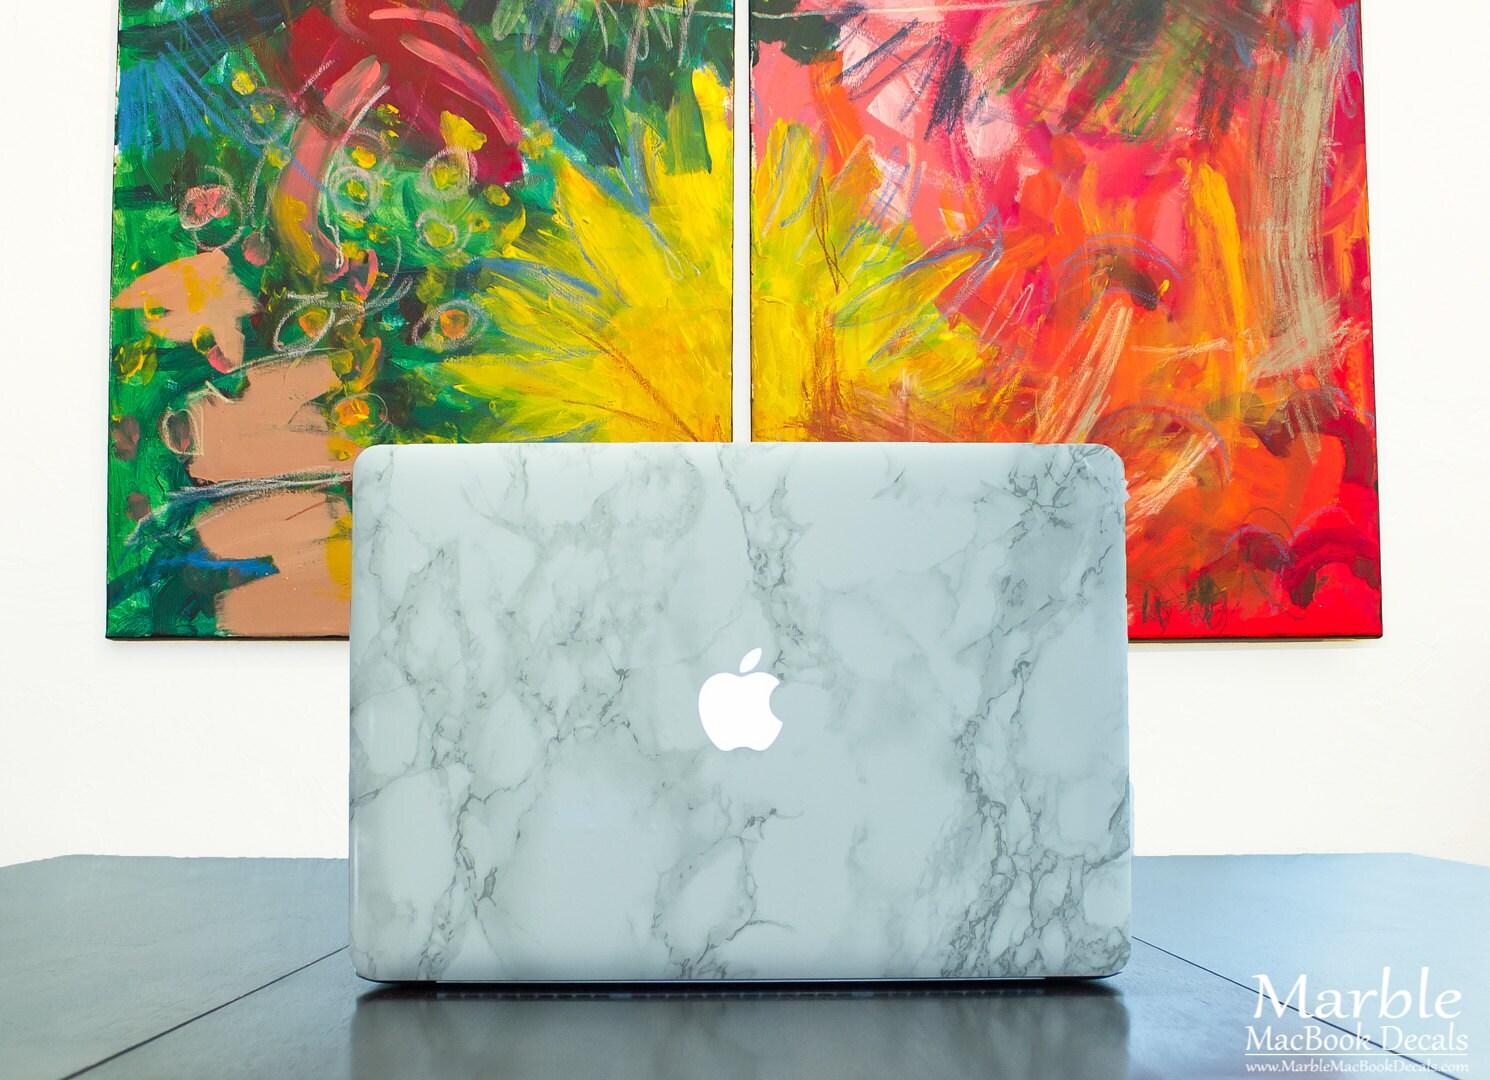 Marble Macbook Sticker Skin Made For Macbook Air Macbook